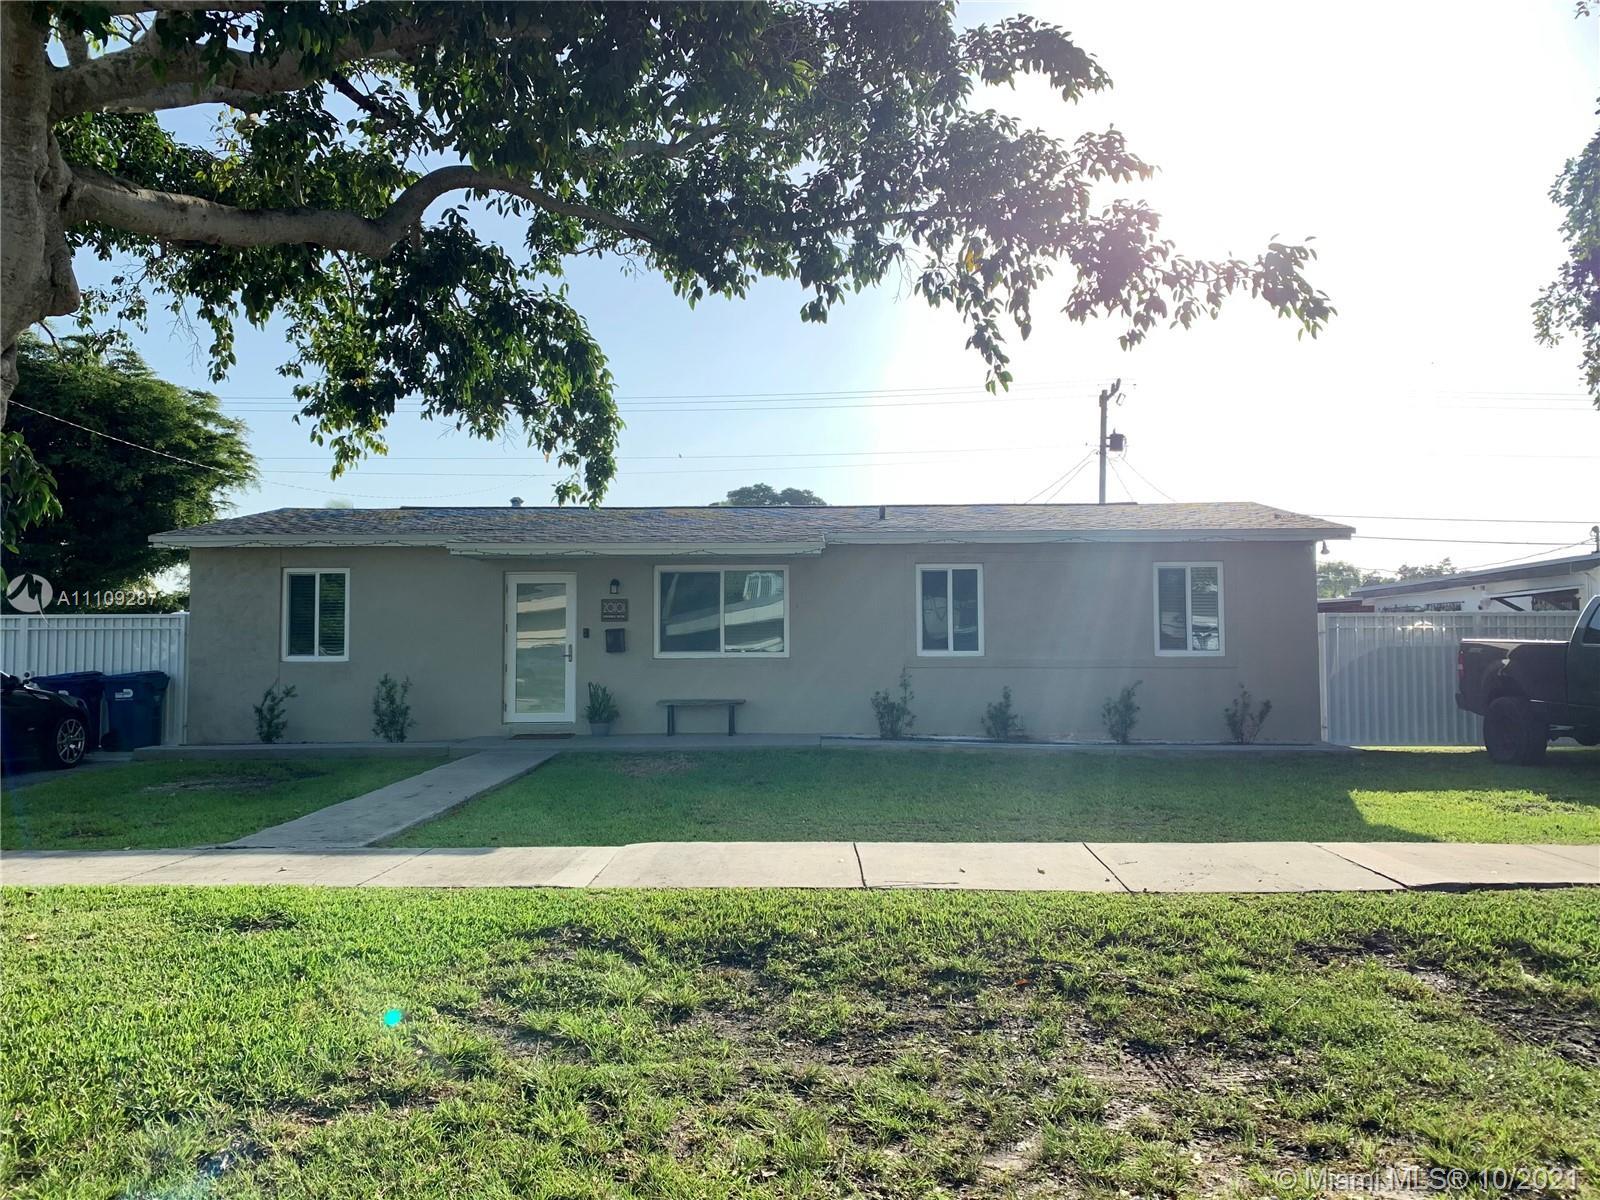 Single Family Home,For Rent,20101 Coral Sea Rd, Cutler Bay, Florida 33189,Brickell,realty,broker,condos near me